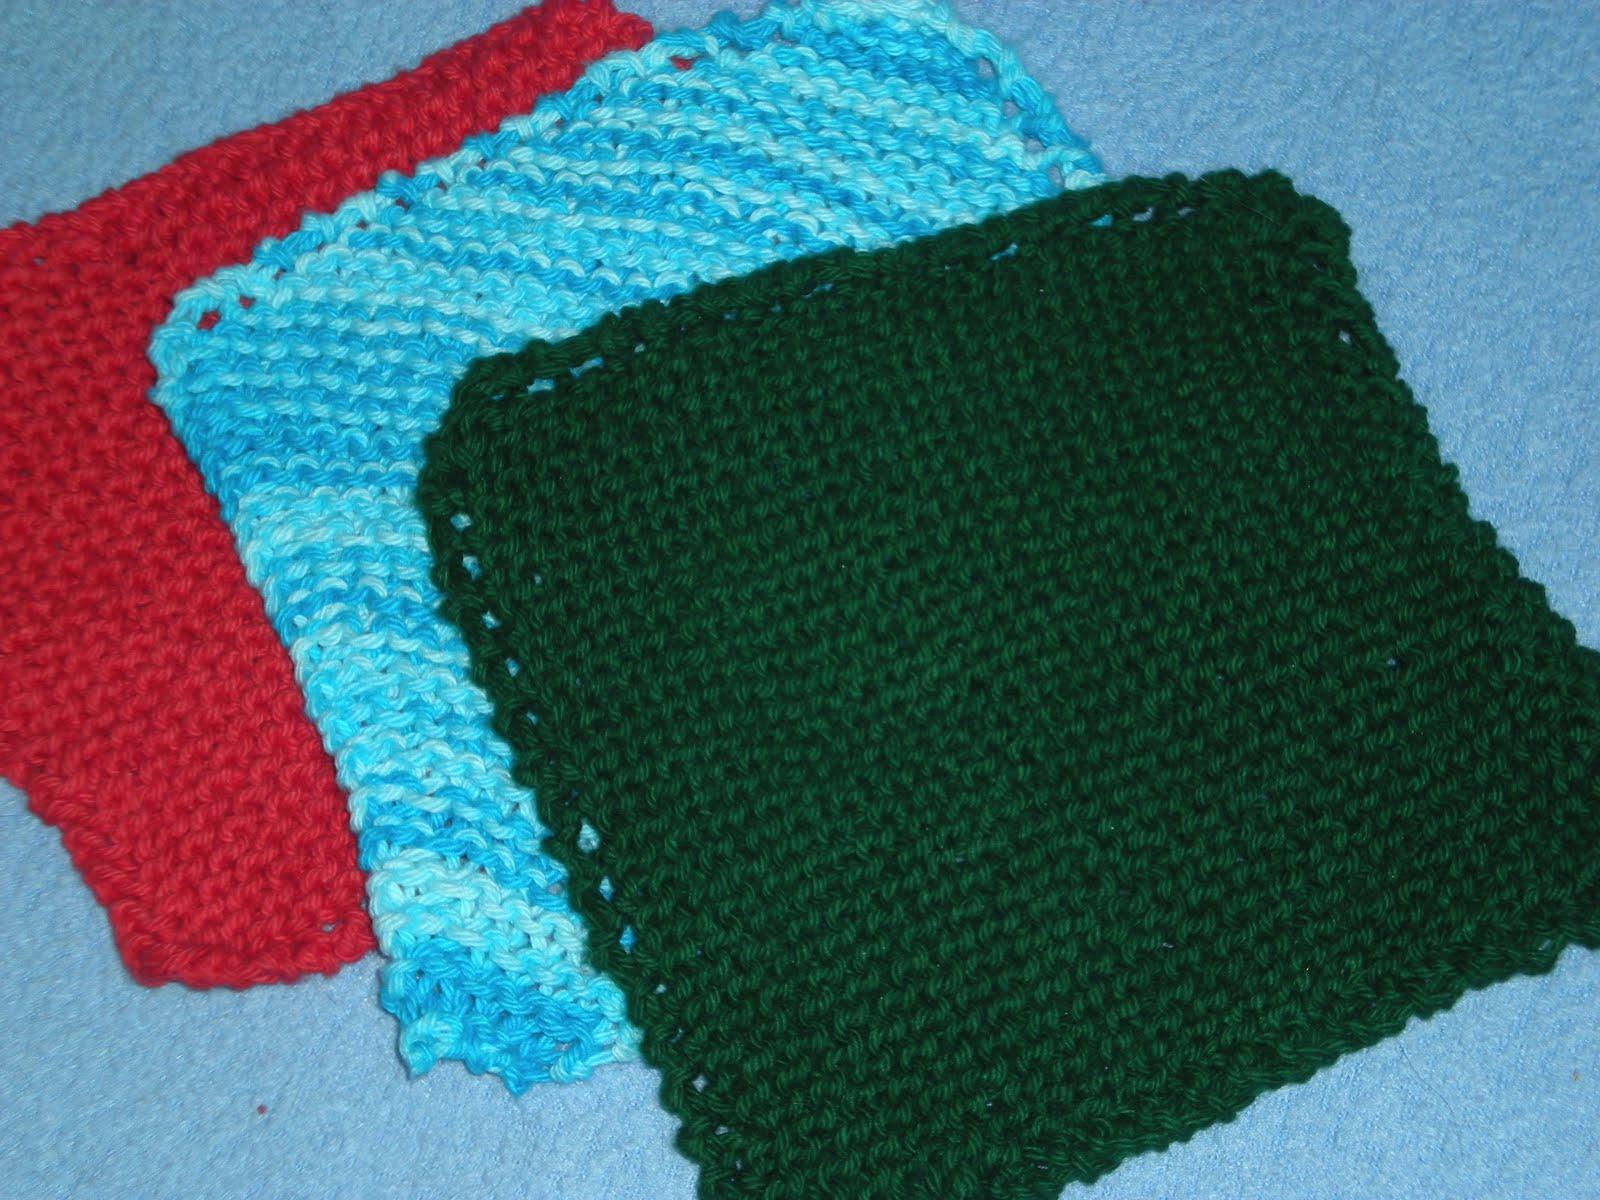 Easy Knit Dishcloths - Christmas Crafts, Free Knitting Patterns